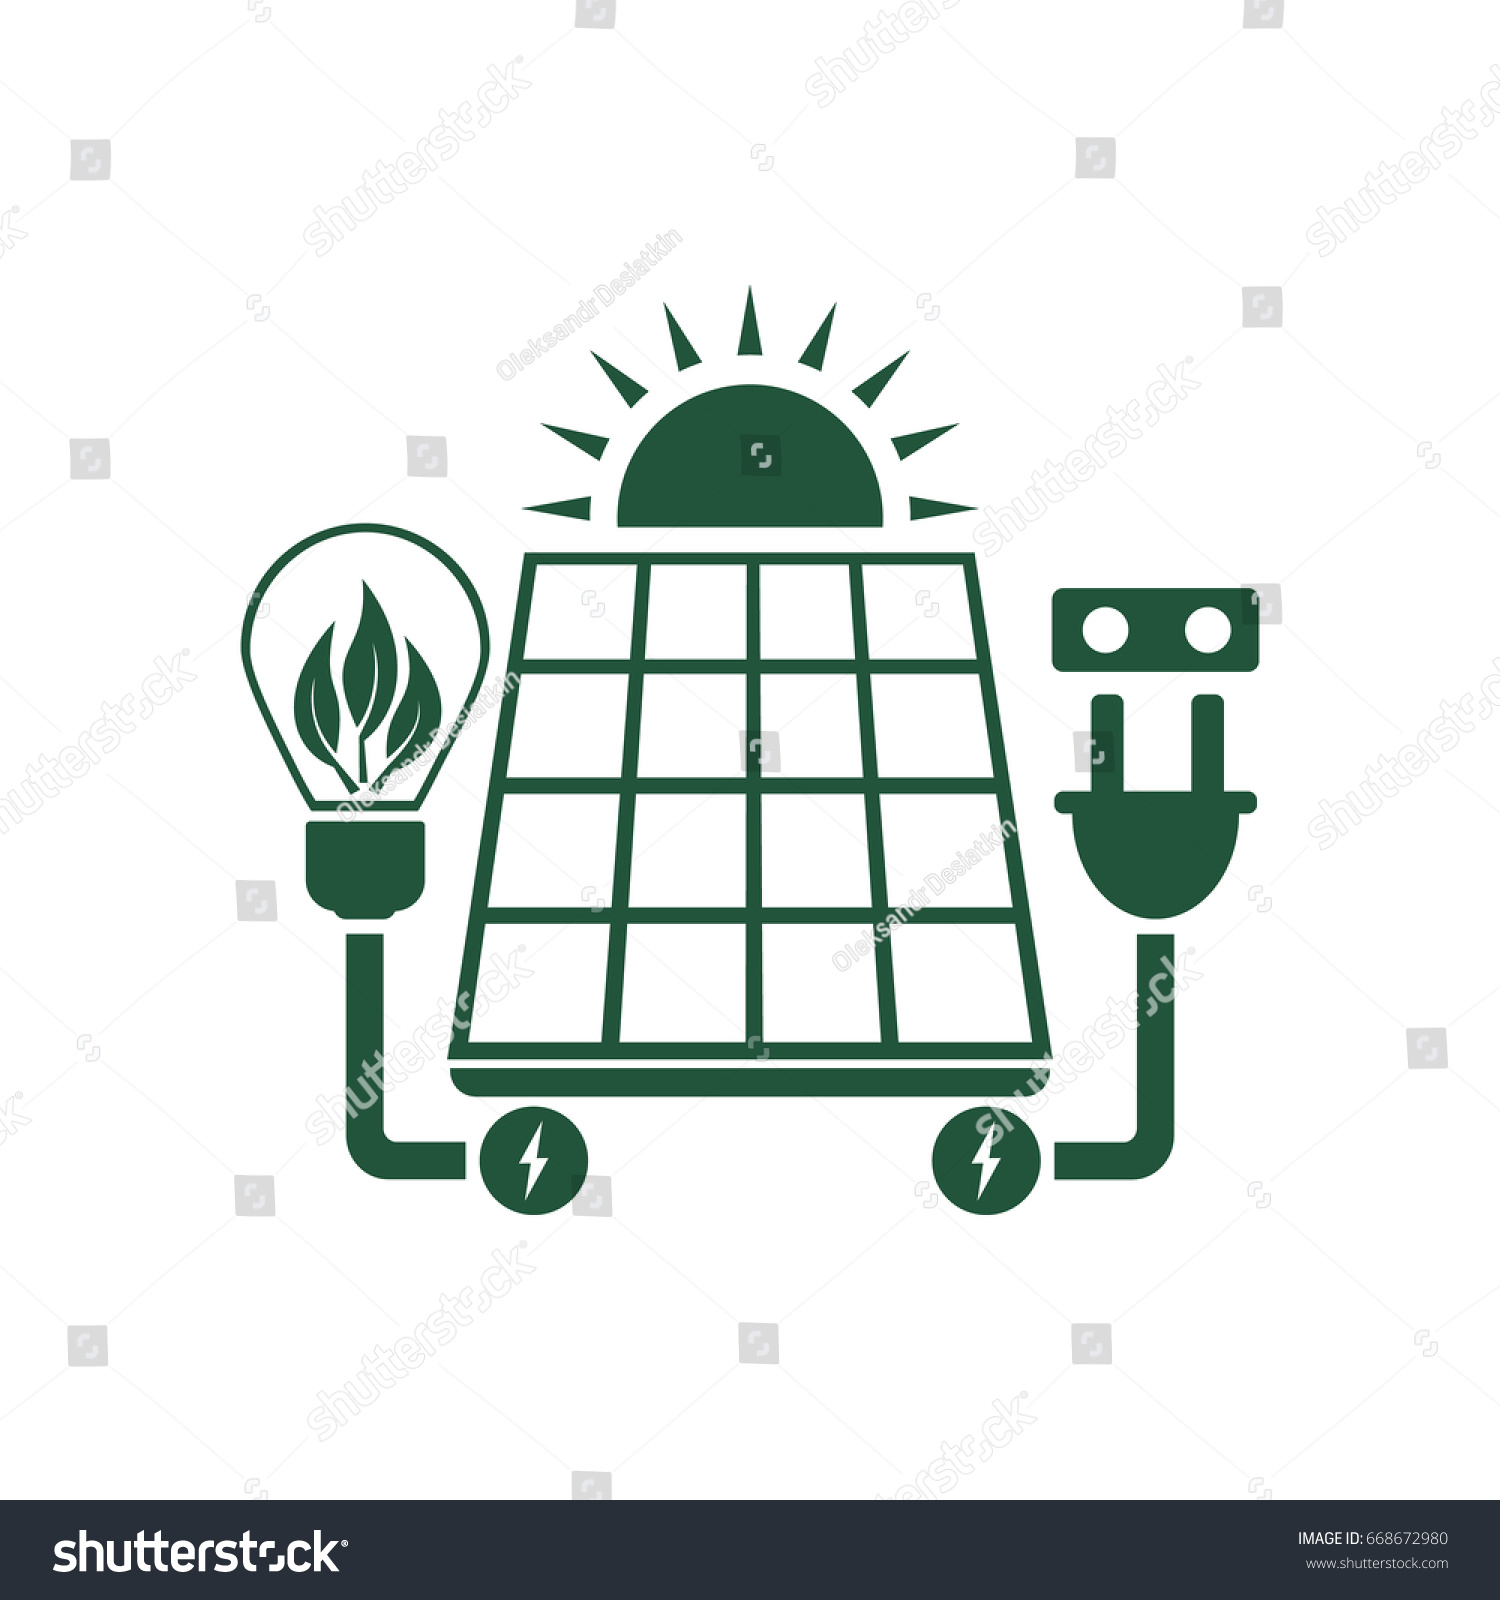 Berühmt Energiesystem Symbole Fotos - Der Schaltplan - greigo.com